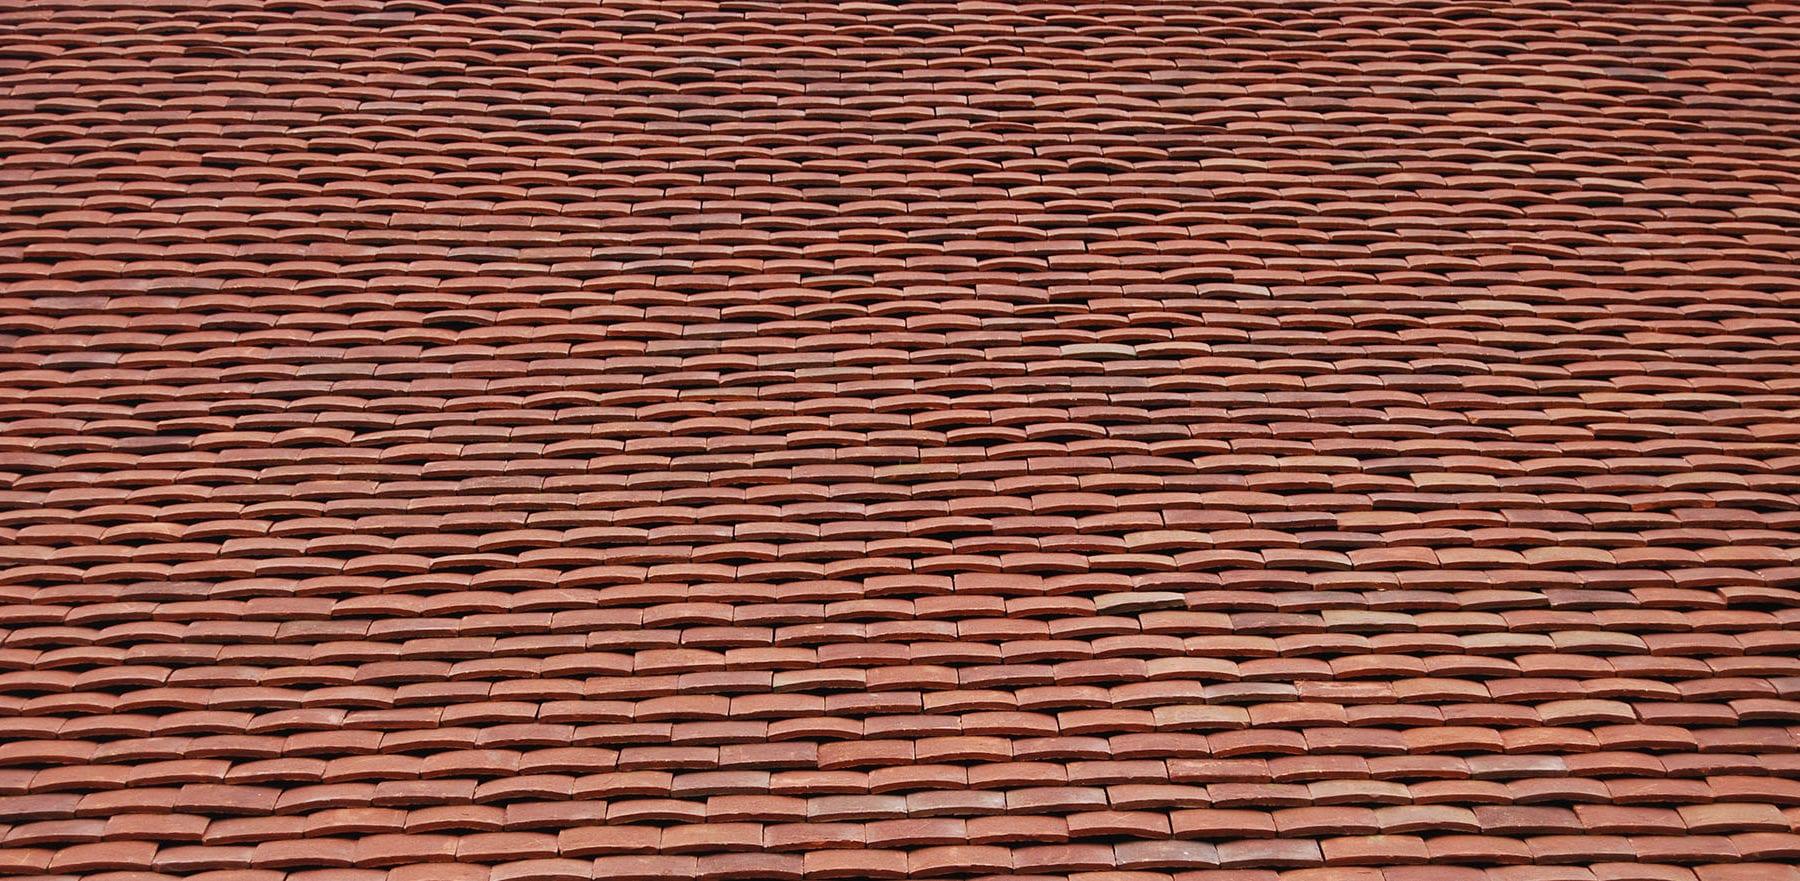 Lifestiles - Handmade Red Clay Roof Tiles - Guestingthorpe, England 3